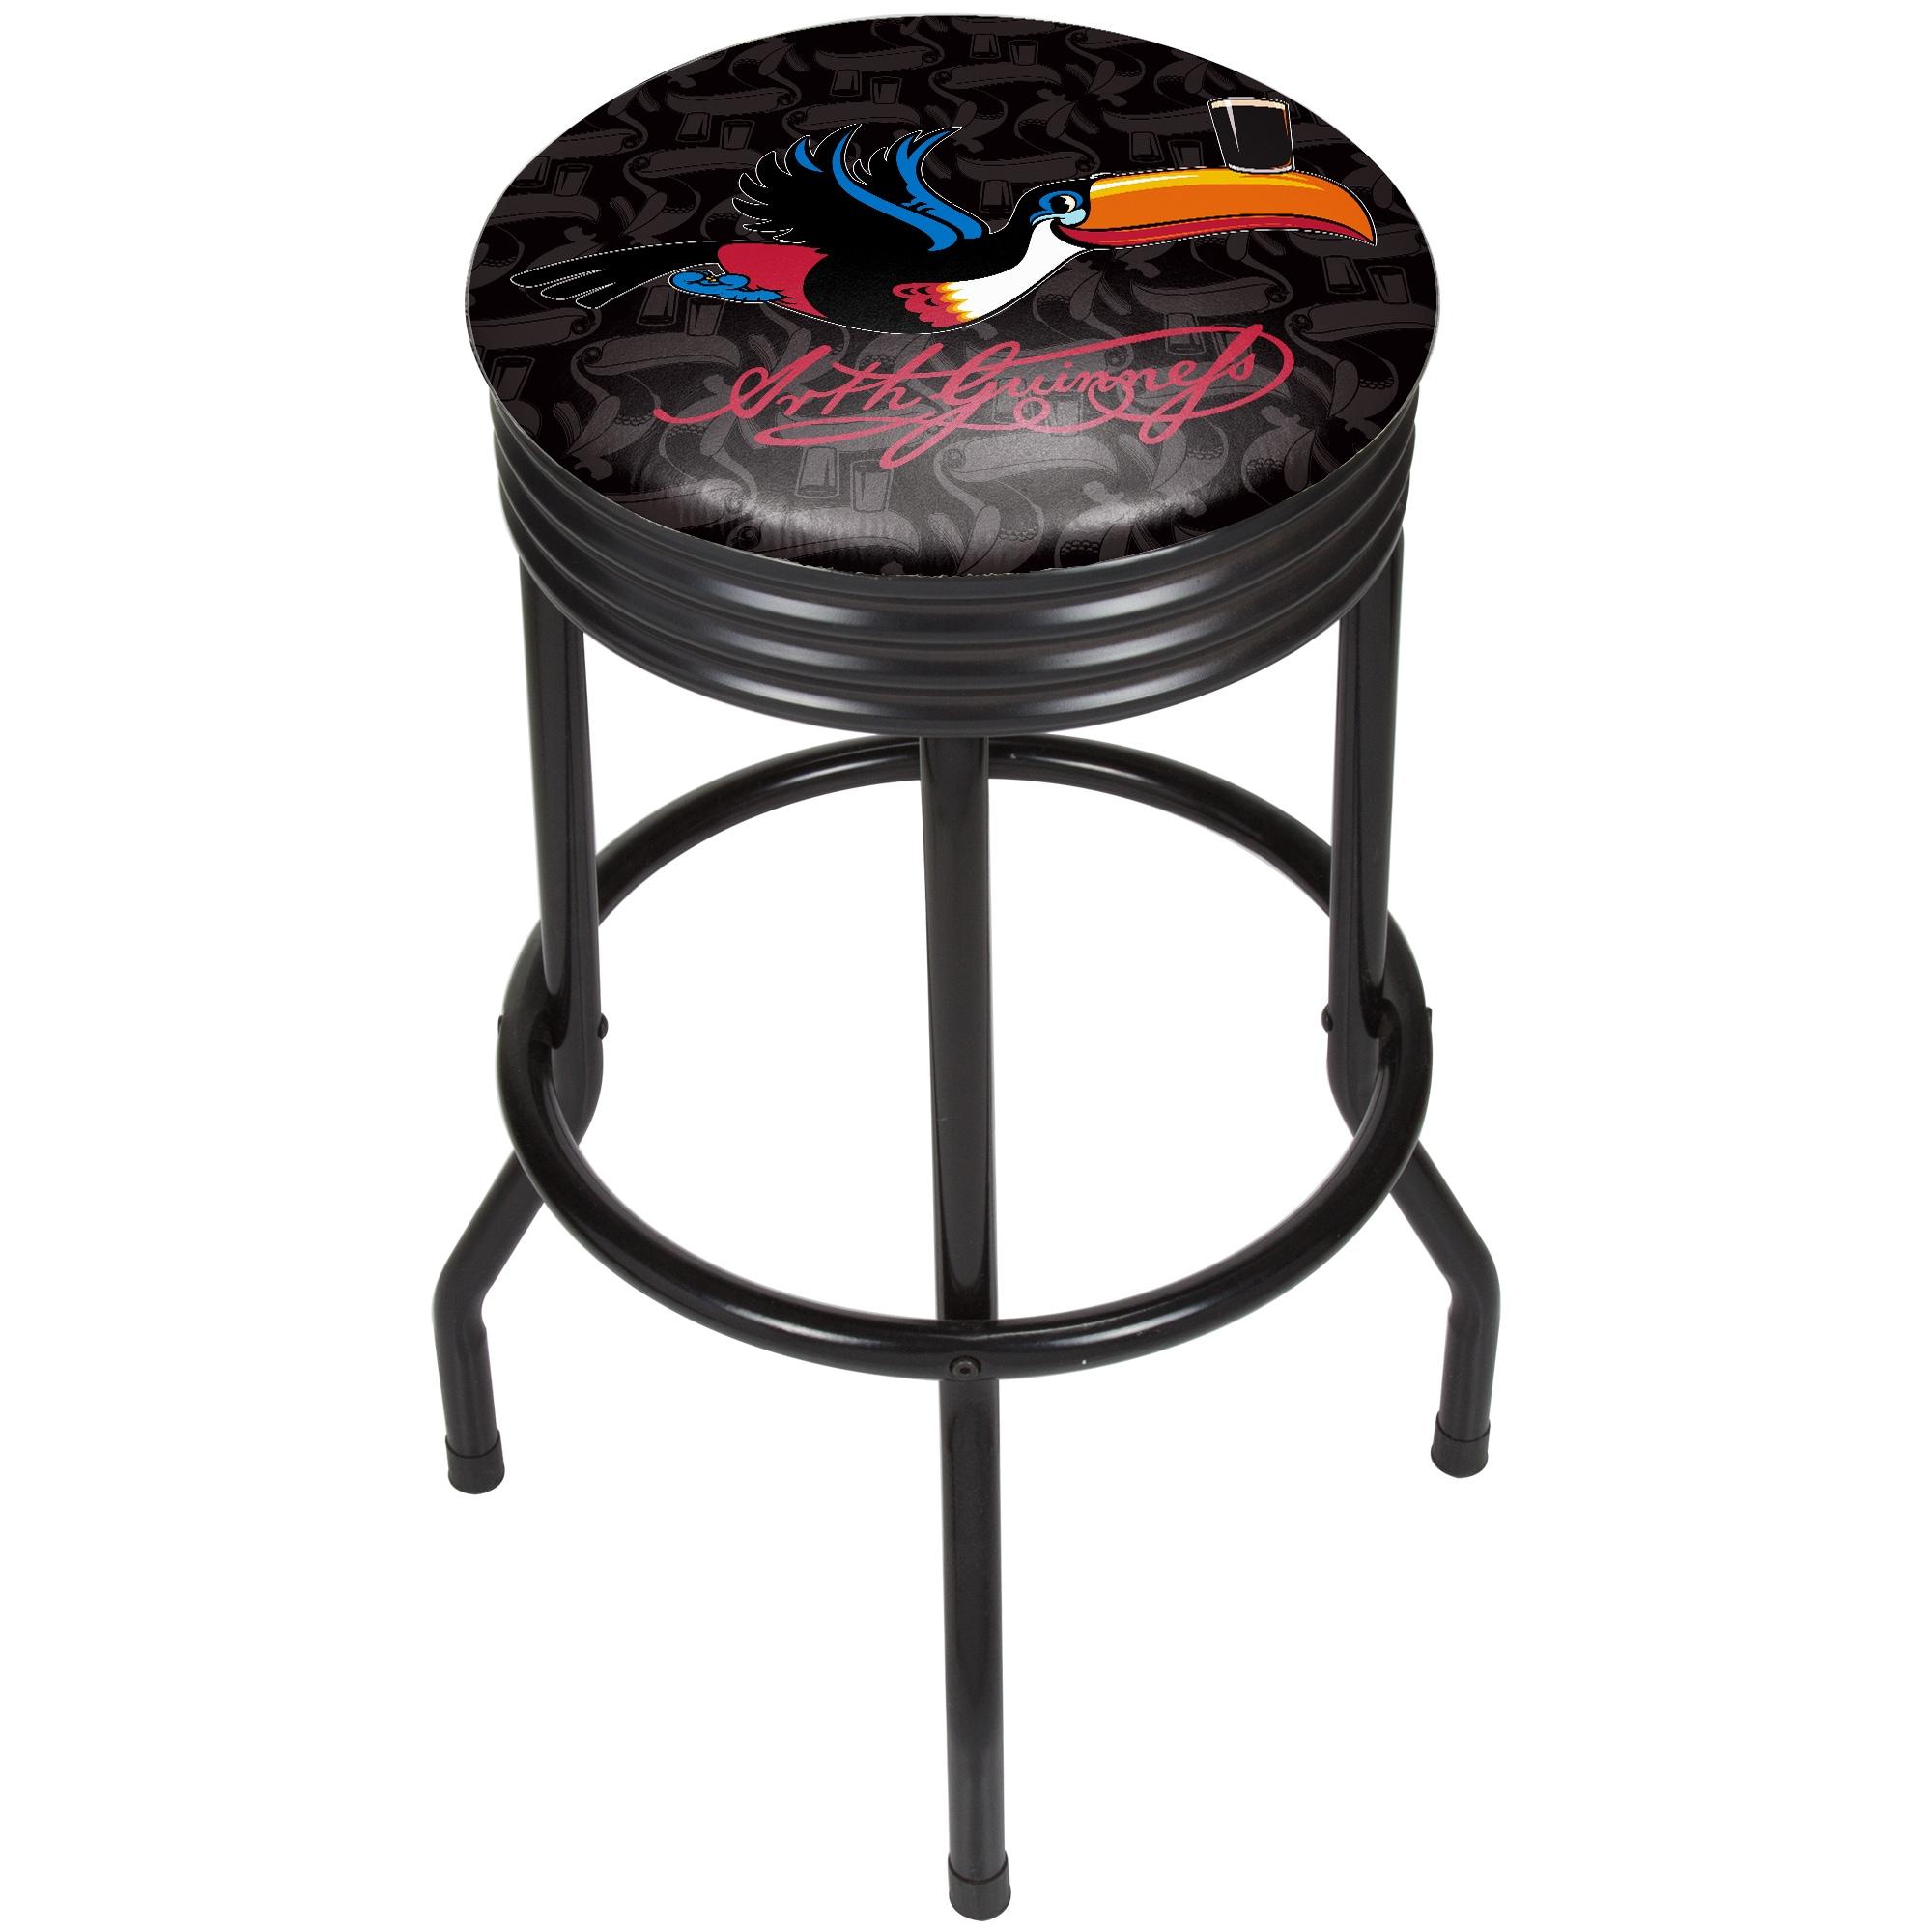 Enjoyable Buy Black Guinness Counter Bar Stools Online At Overstock Lamtechconsult Wood Chair Design Ideas Lamtechconsultcom